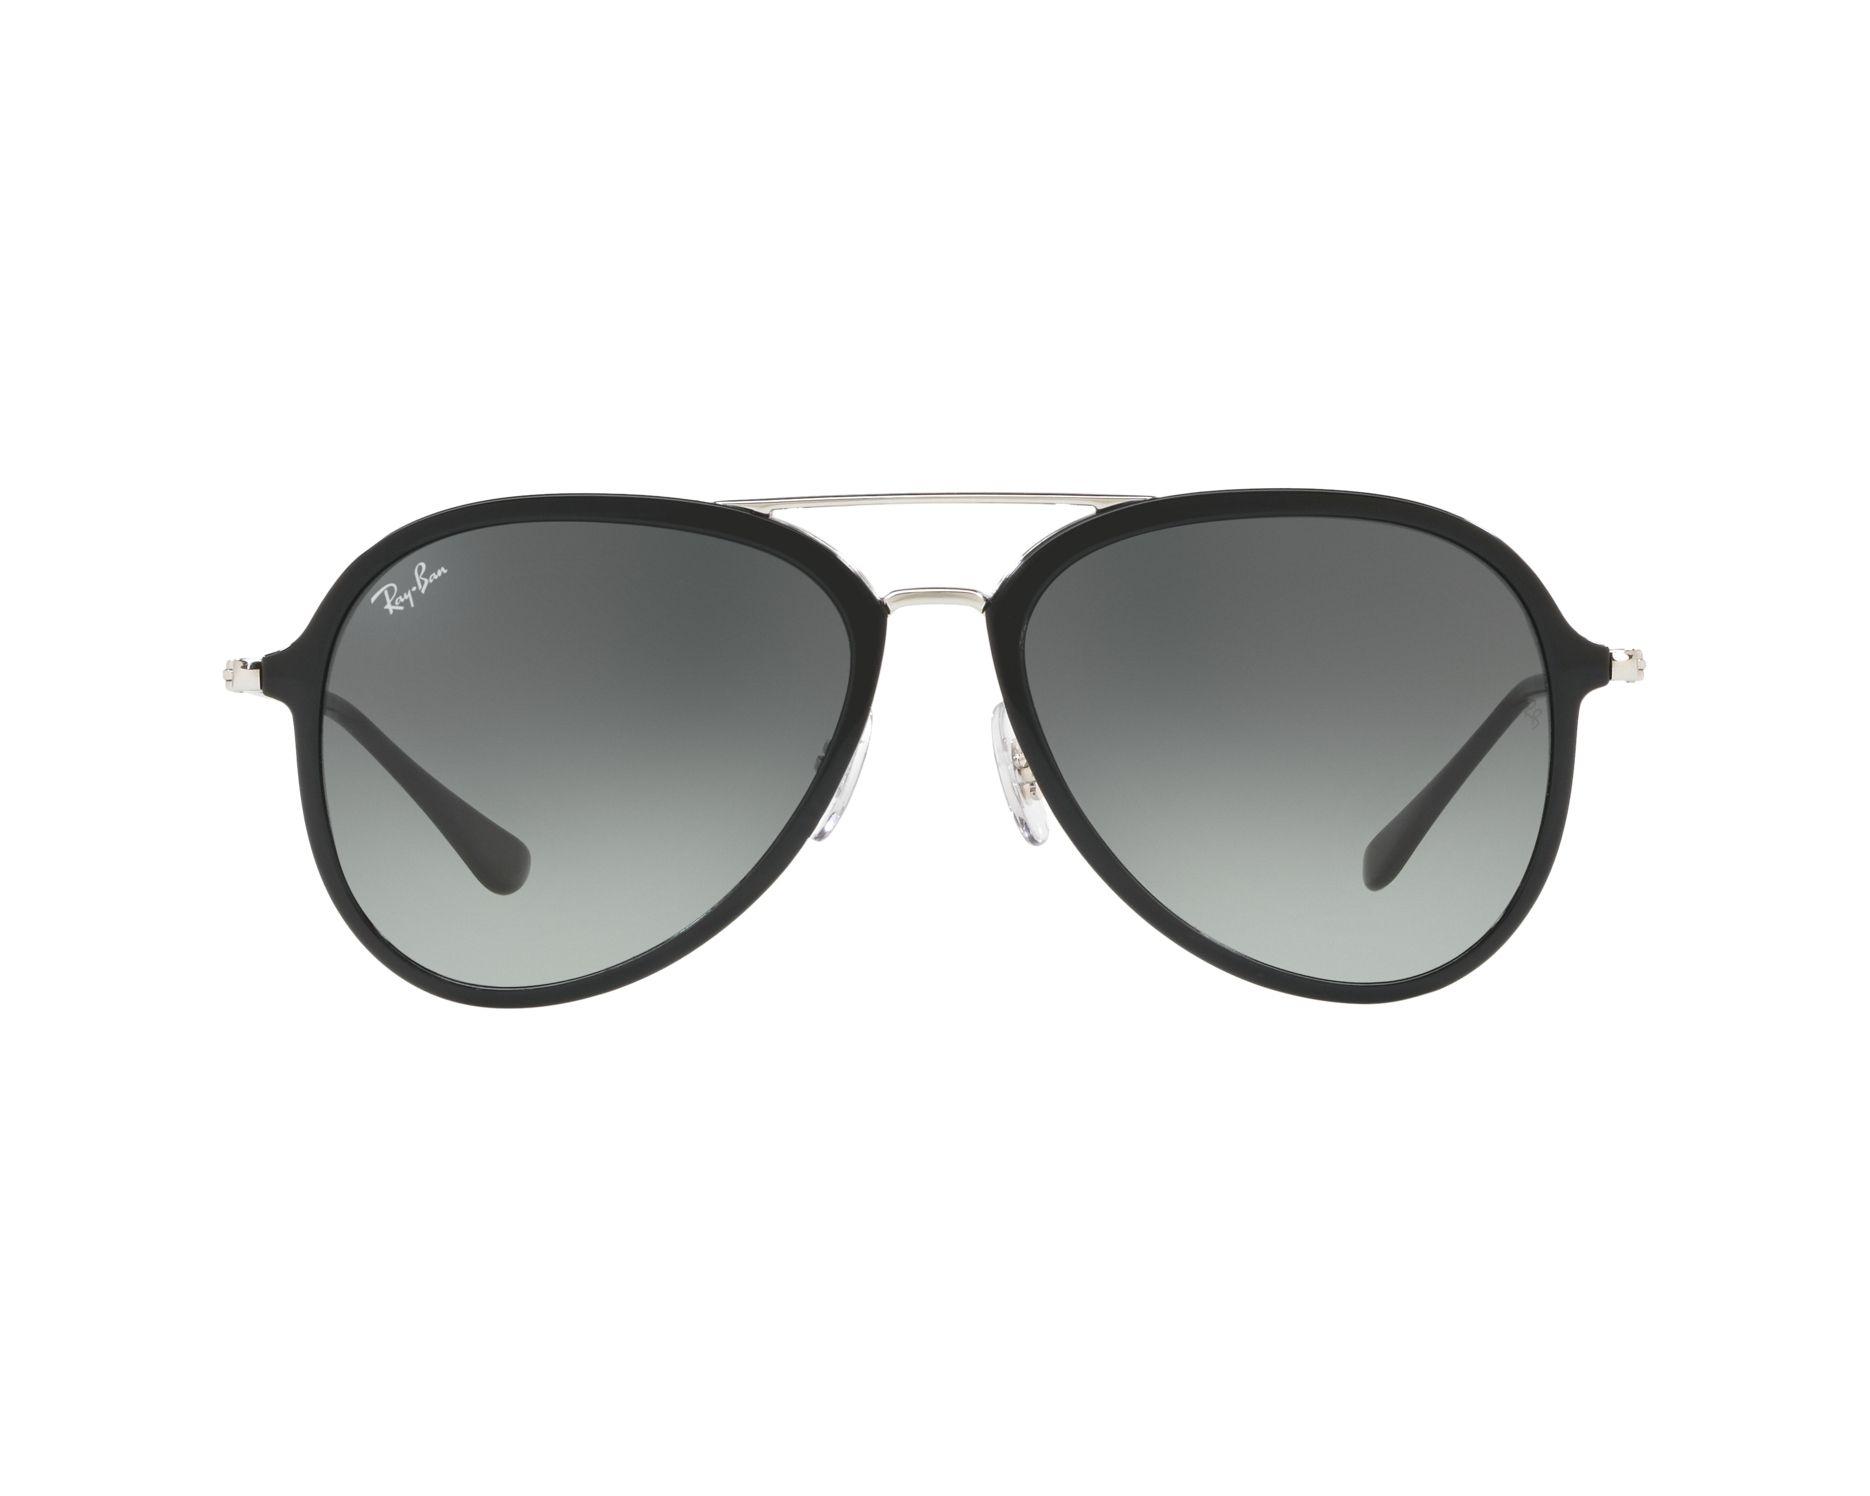 791719c8b0 Sunglasses Ray-Ban RB-4298 601 71 57-17 Black Silver 360